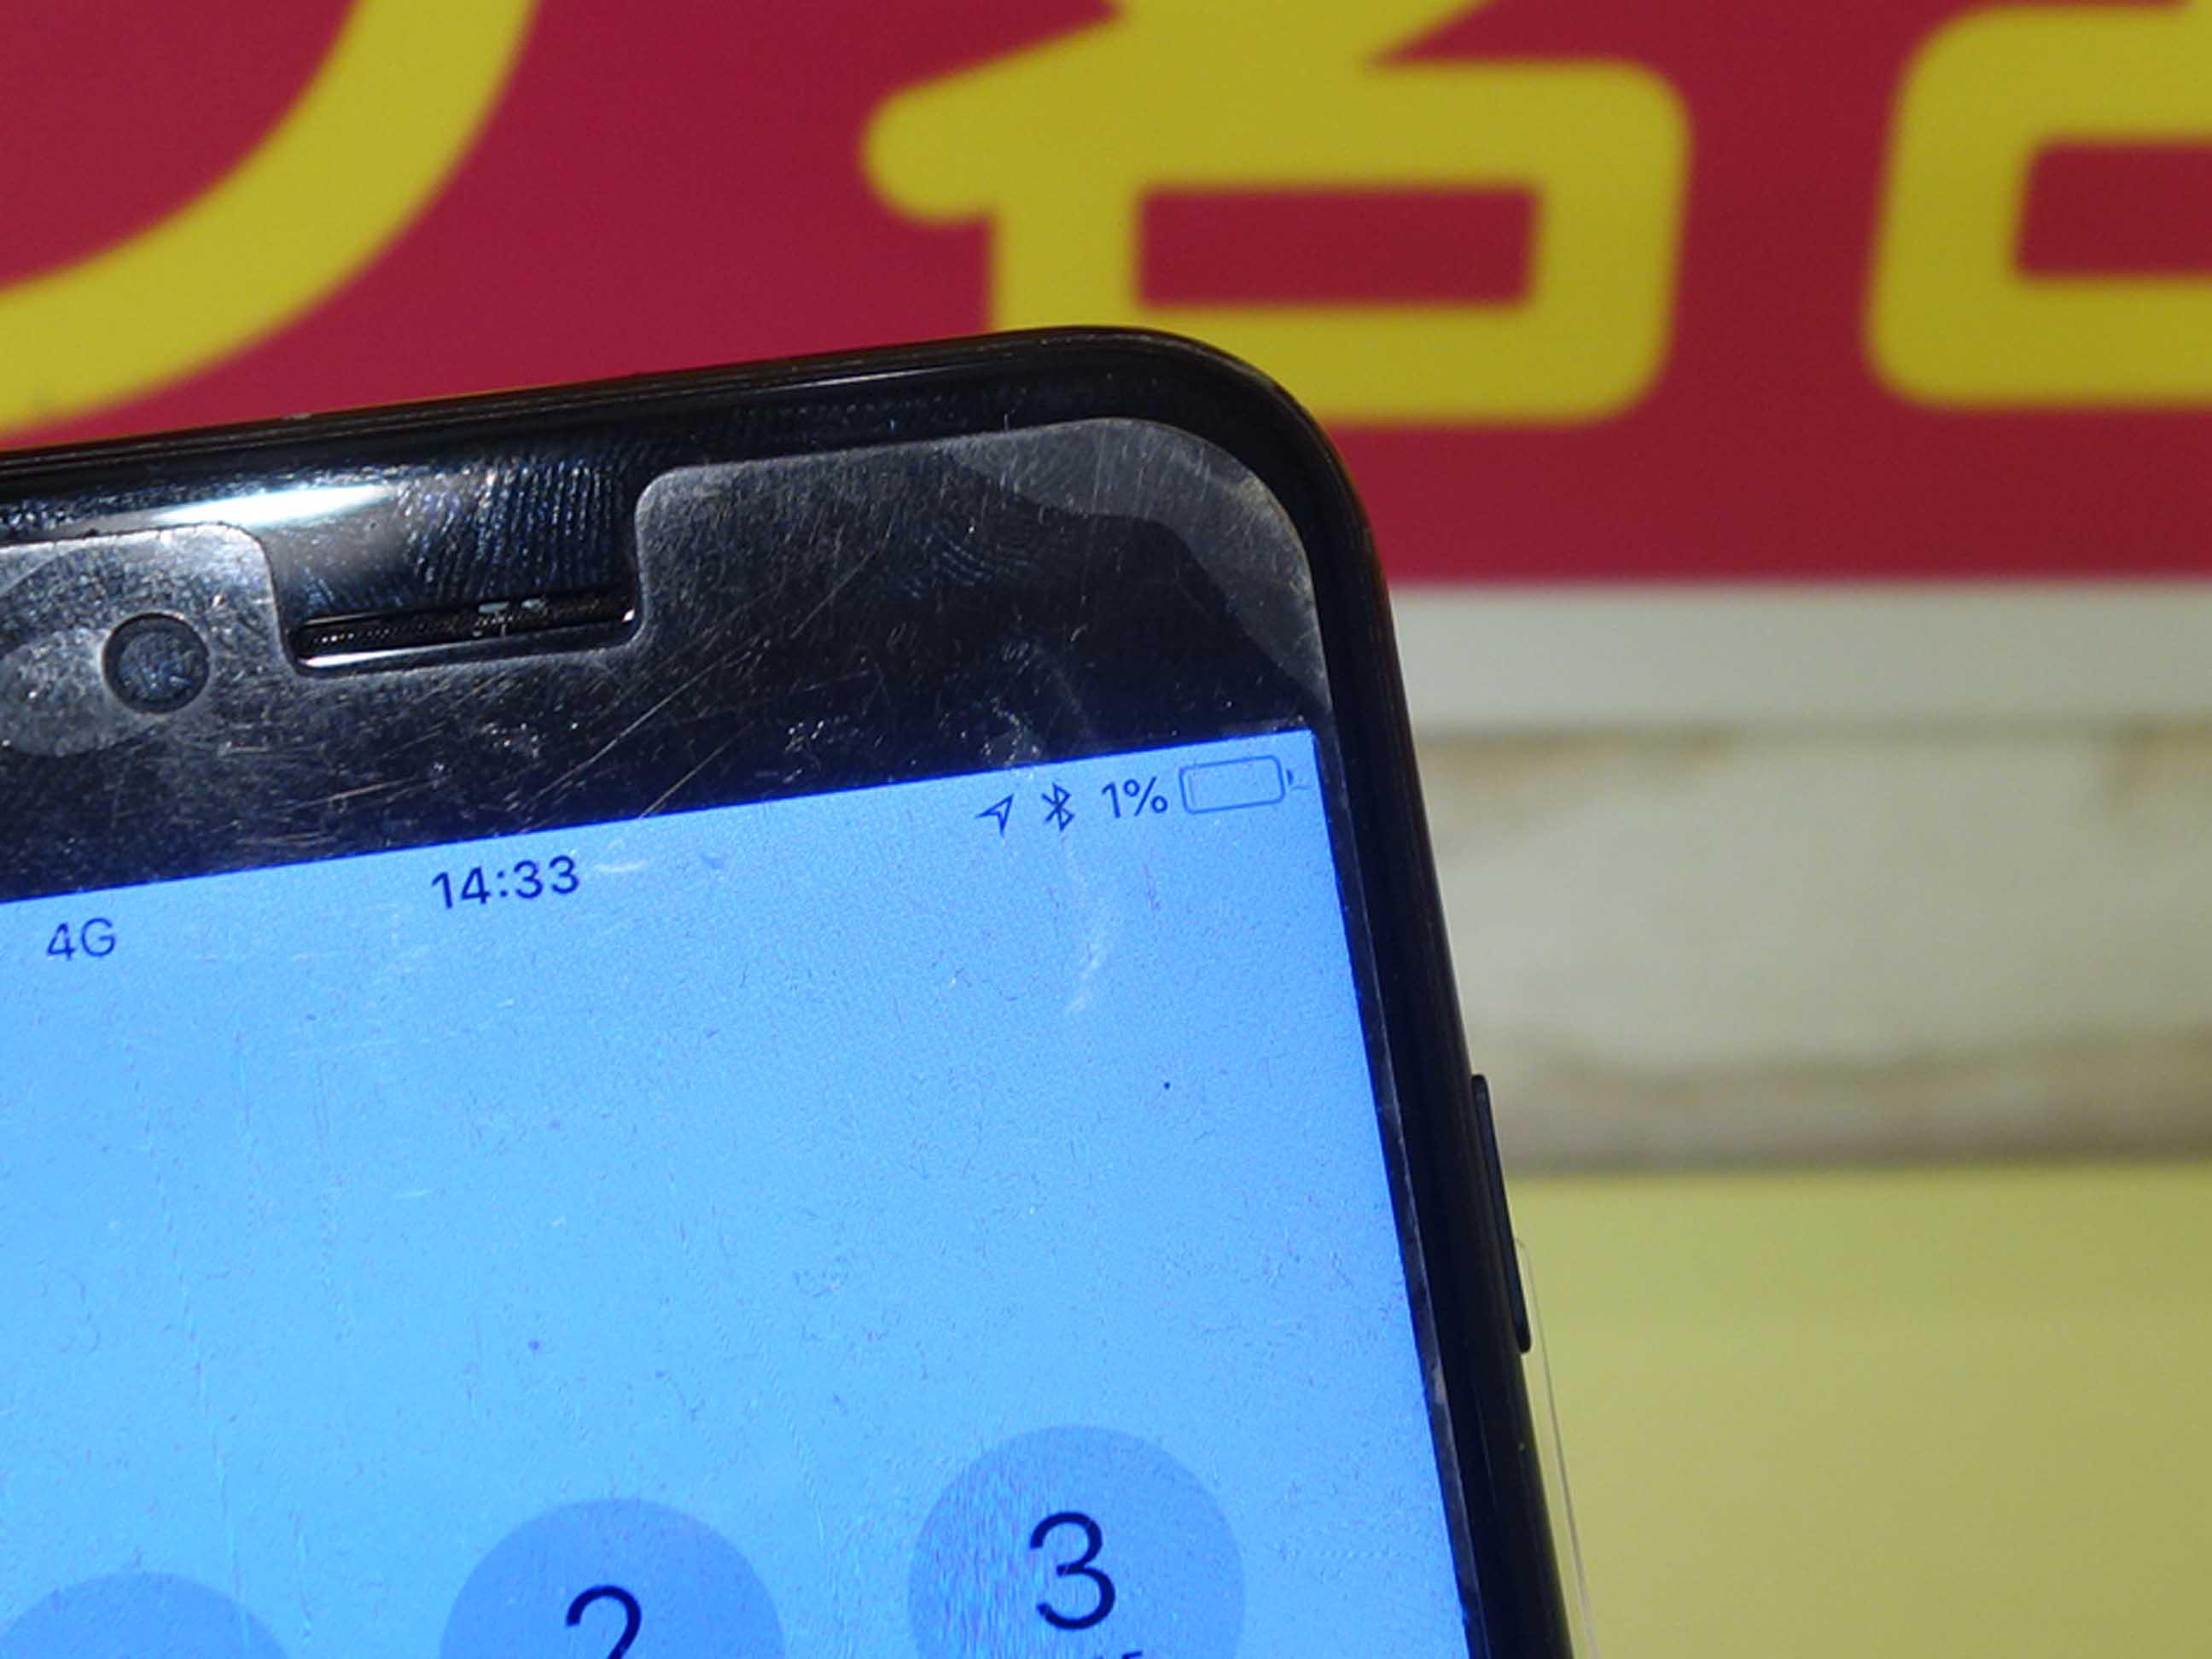 iPhone7のドックコネクター修理で名古屋市内からご来店!アイフォン修理のクイック名古屋